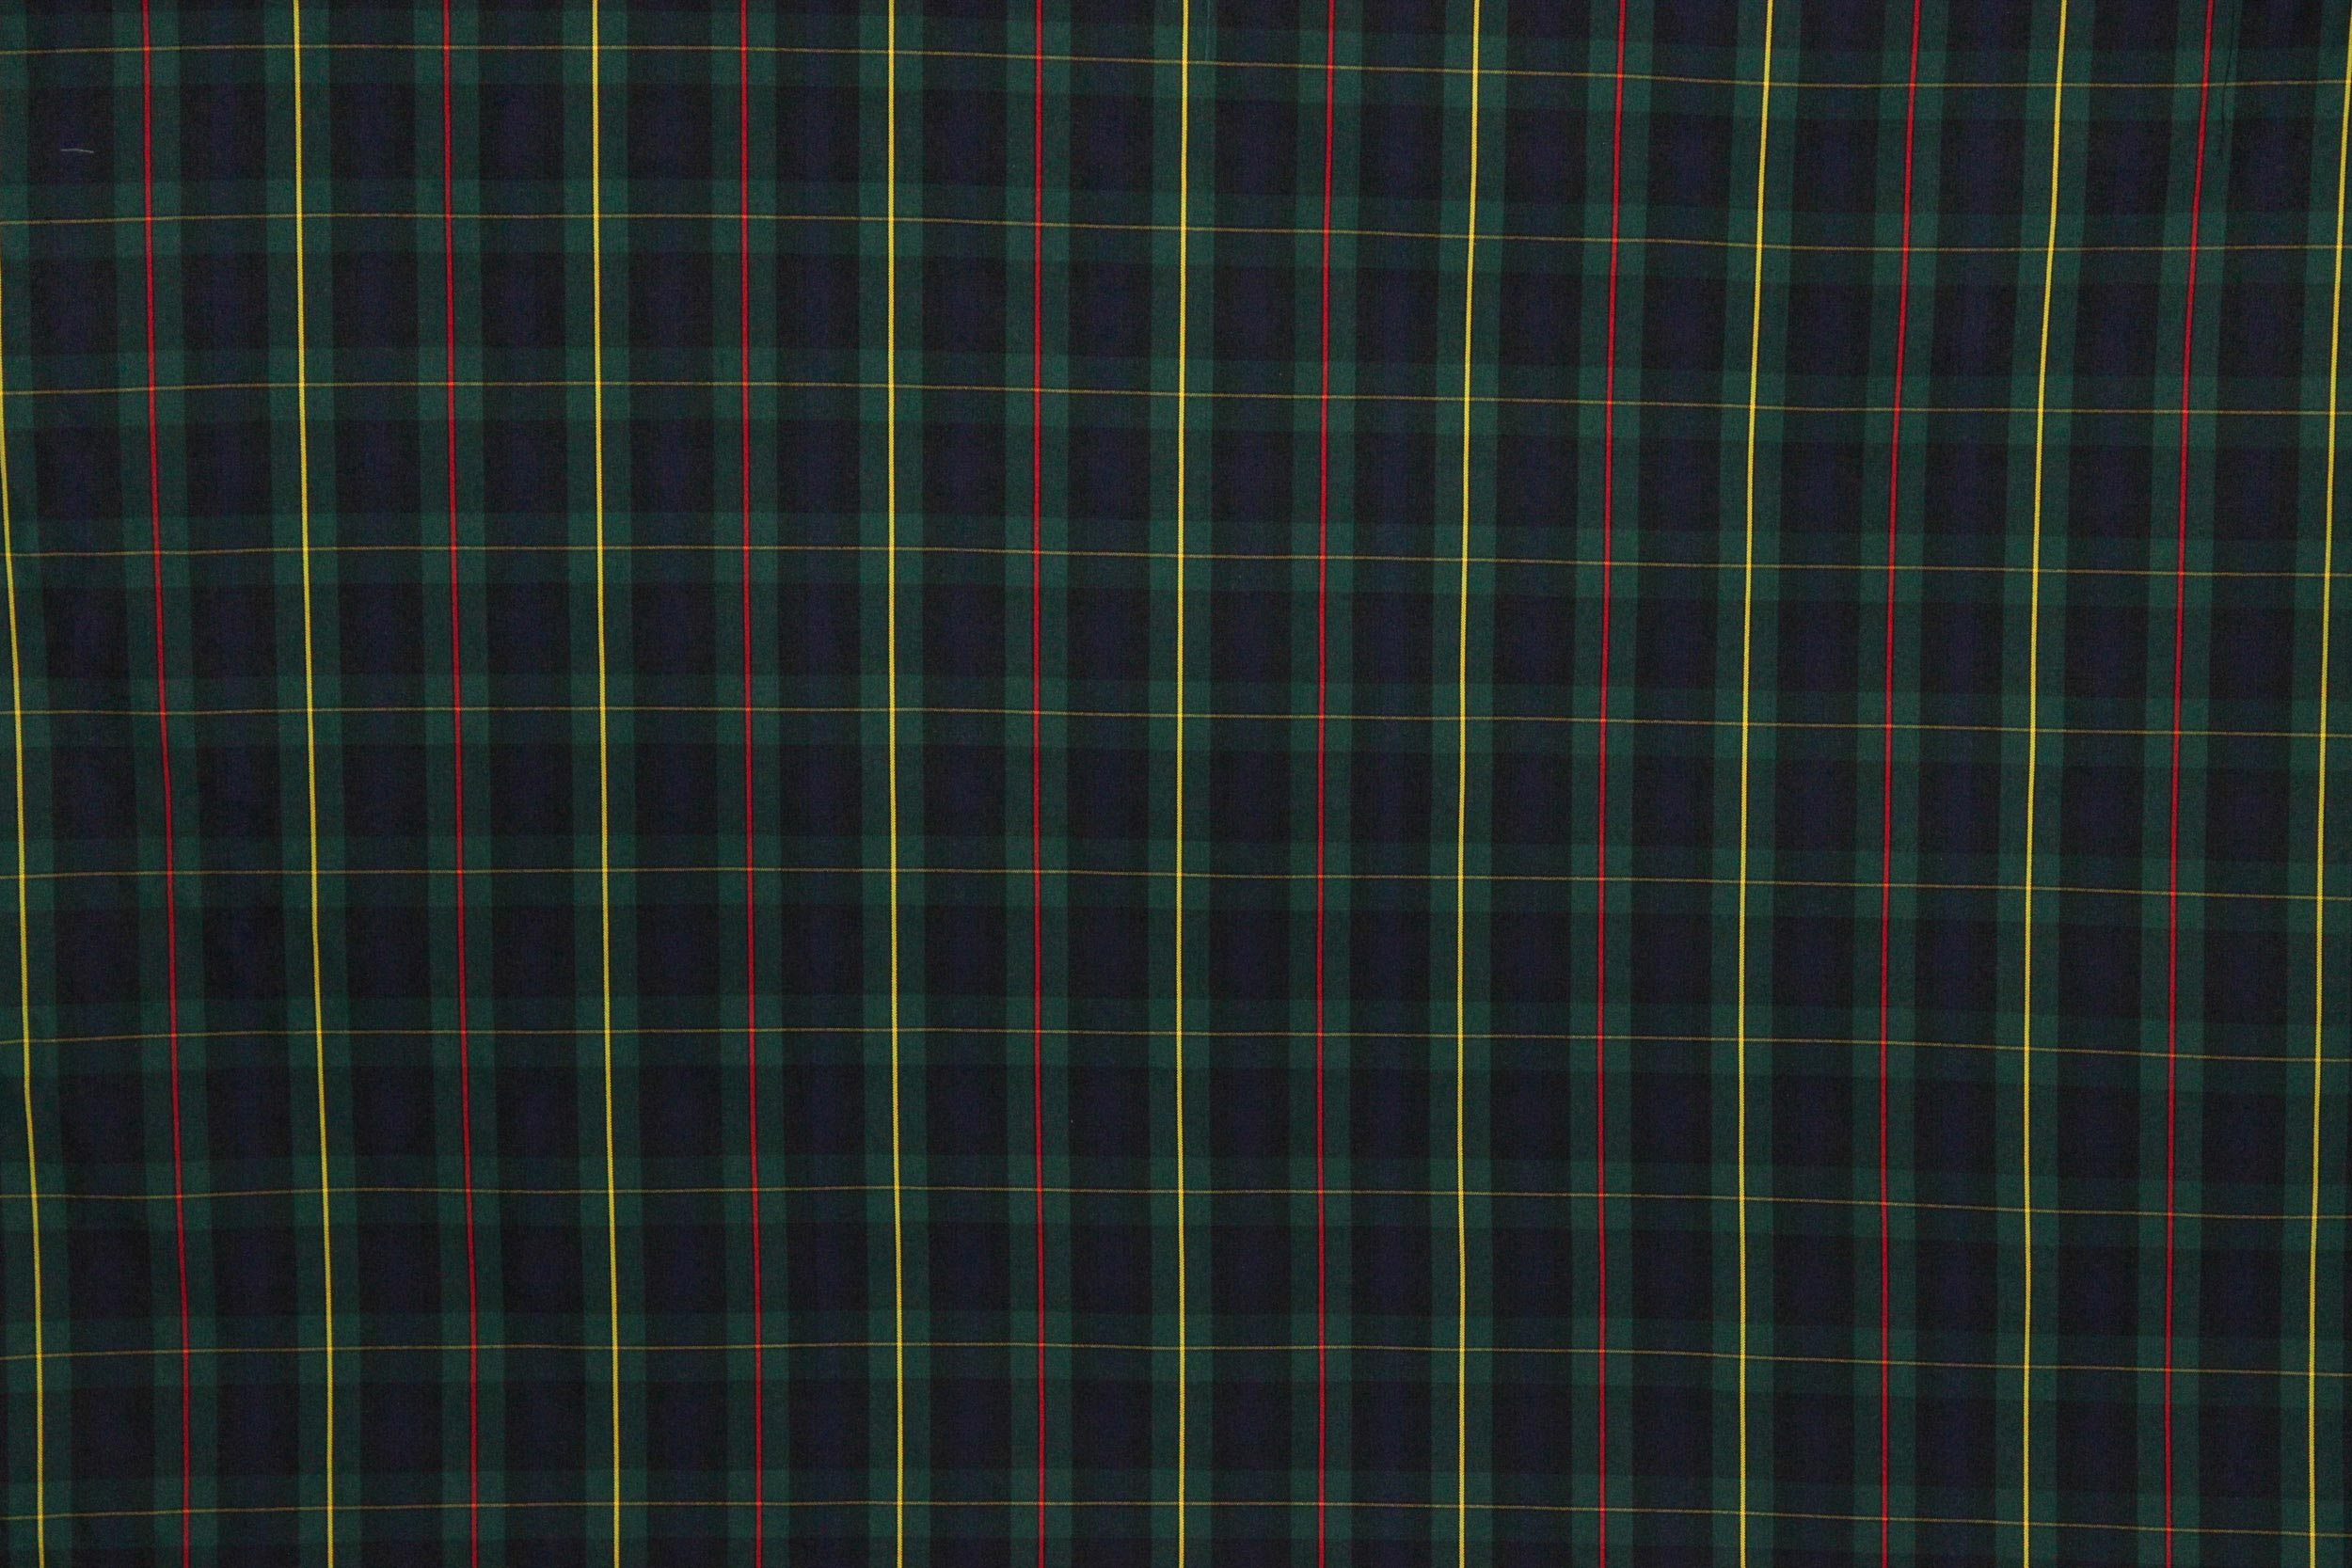 Tartan Plaid Fabric | Green/Navy/Yellow/Red -The Fabric Mill